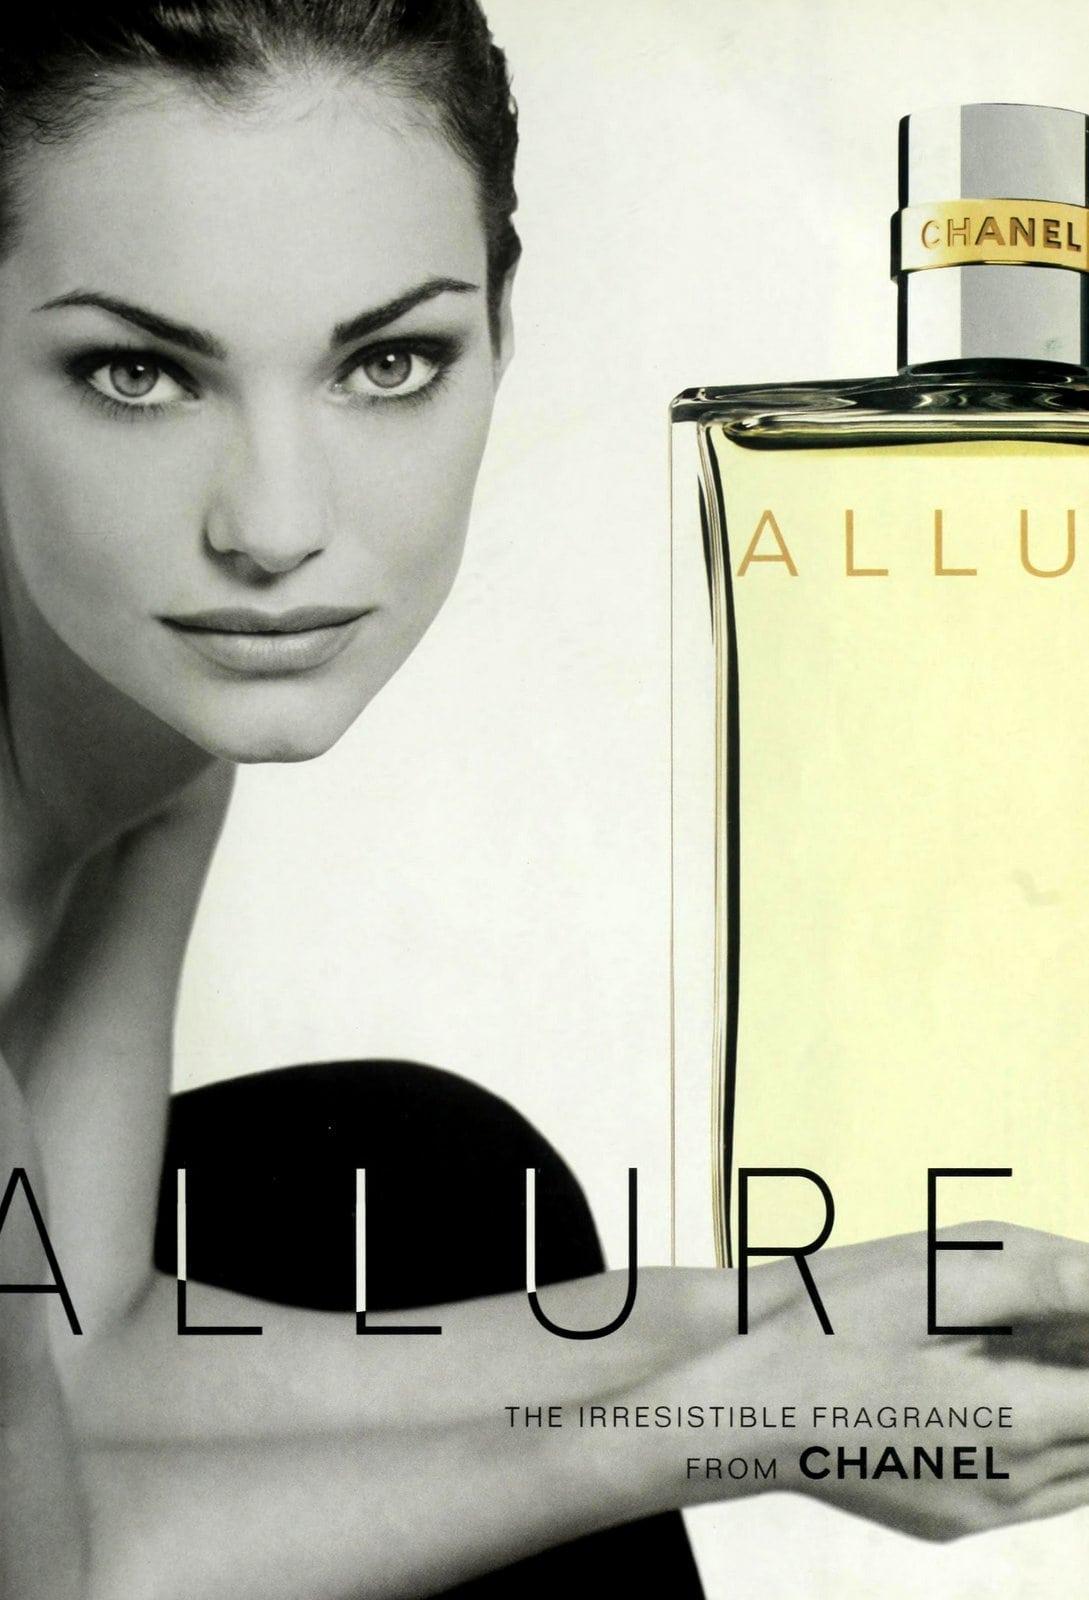 Allure from Chanel (1998) at ClickAmericana.com